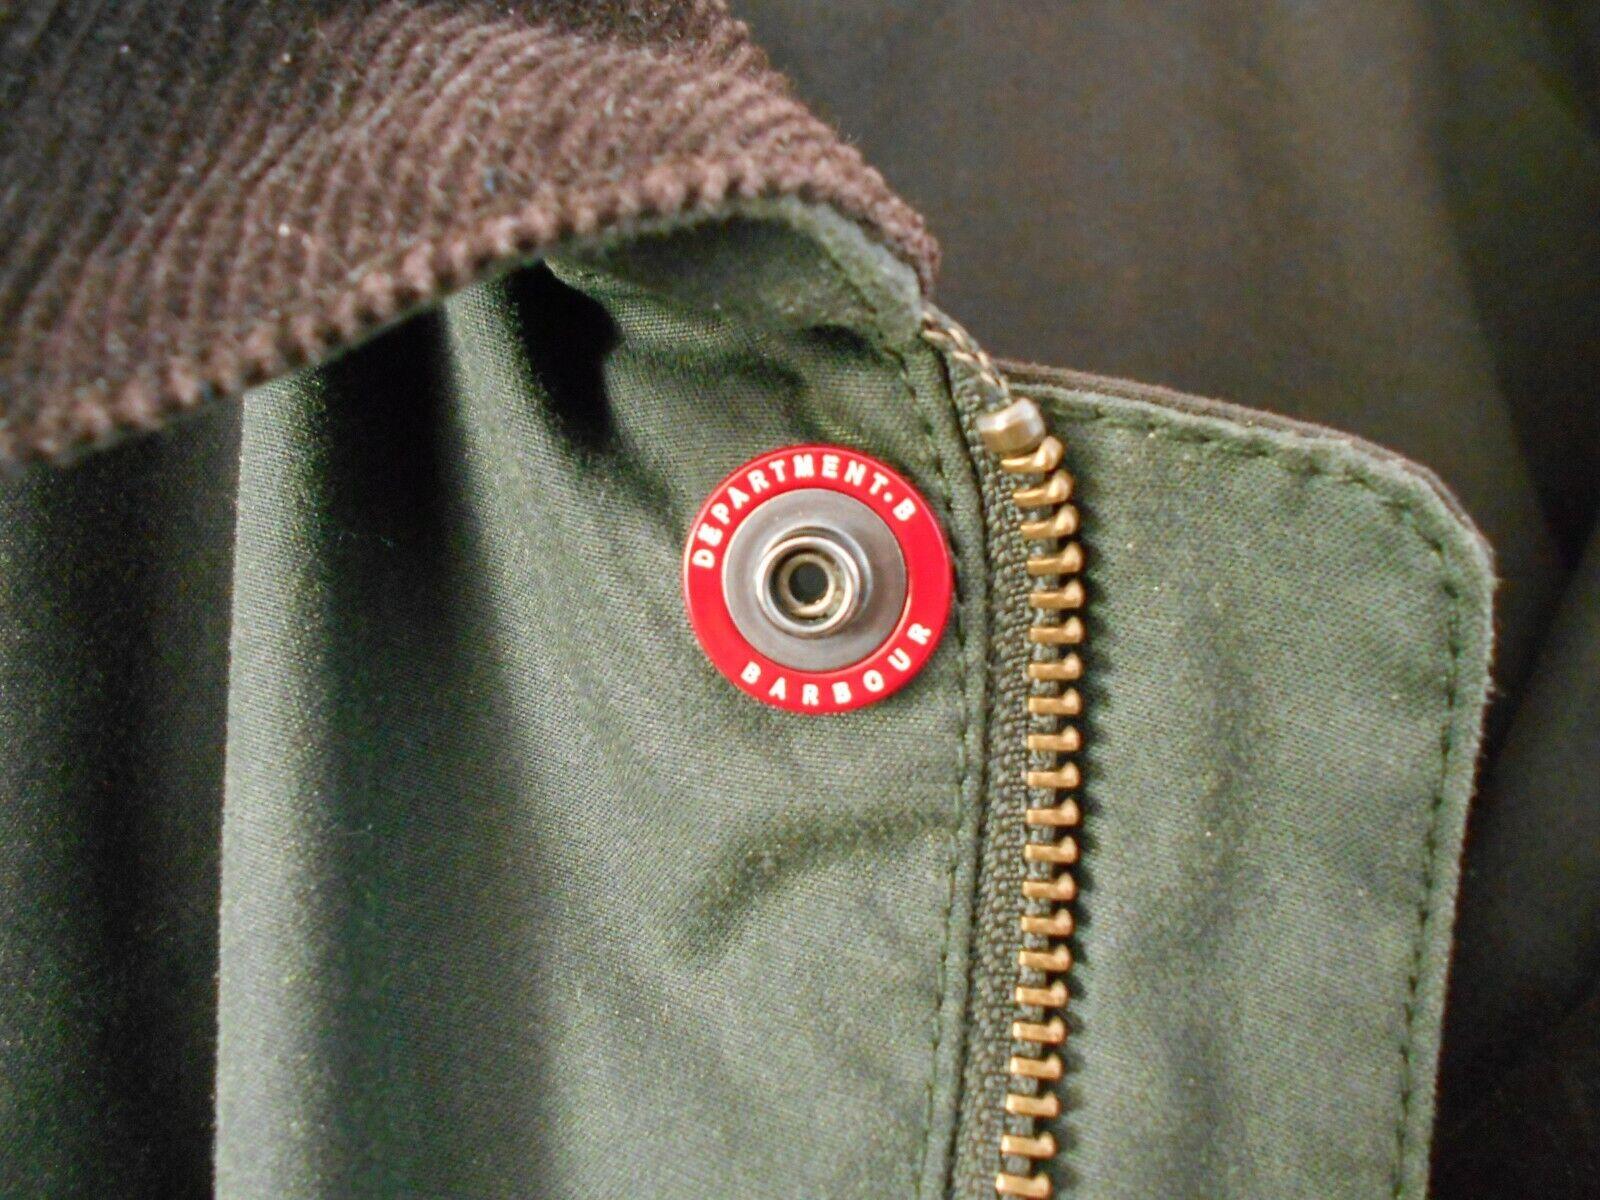 Veste barbour dept b field jacket - special -dark green - sage